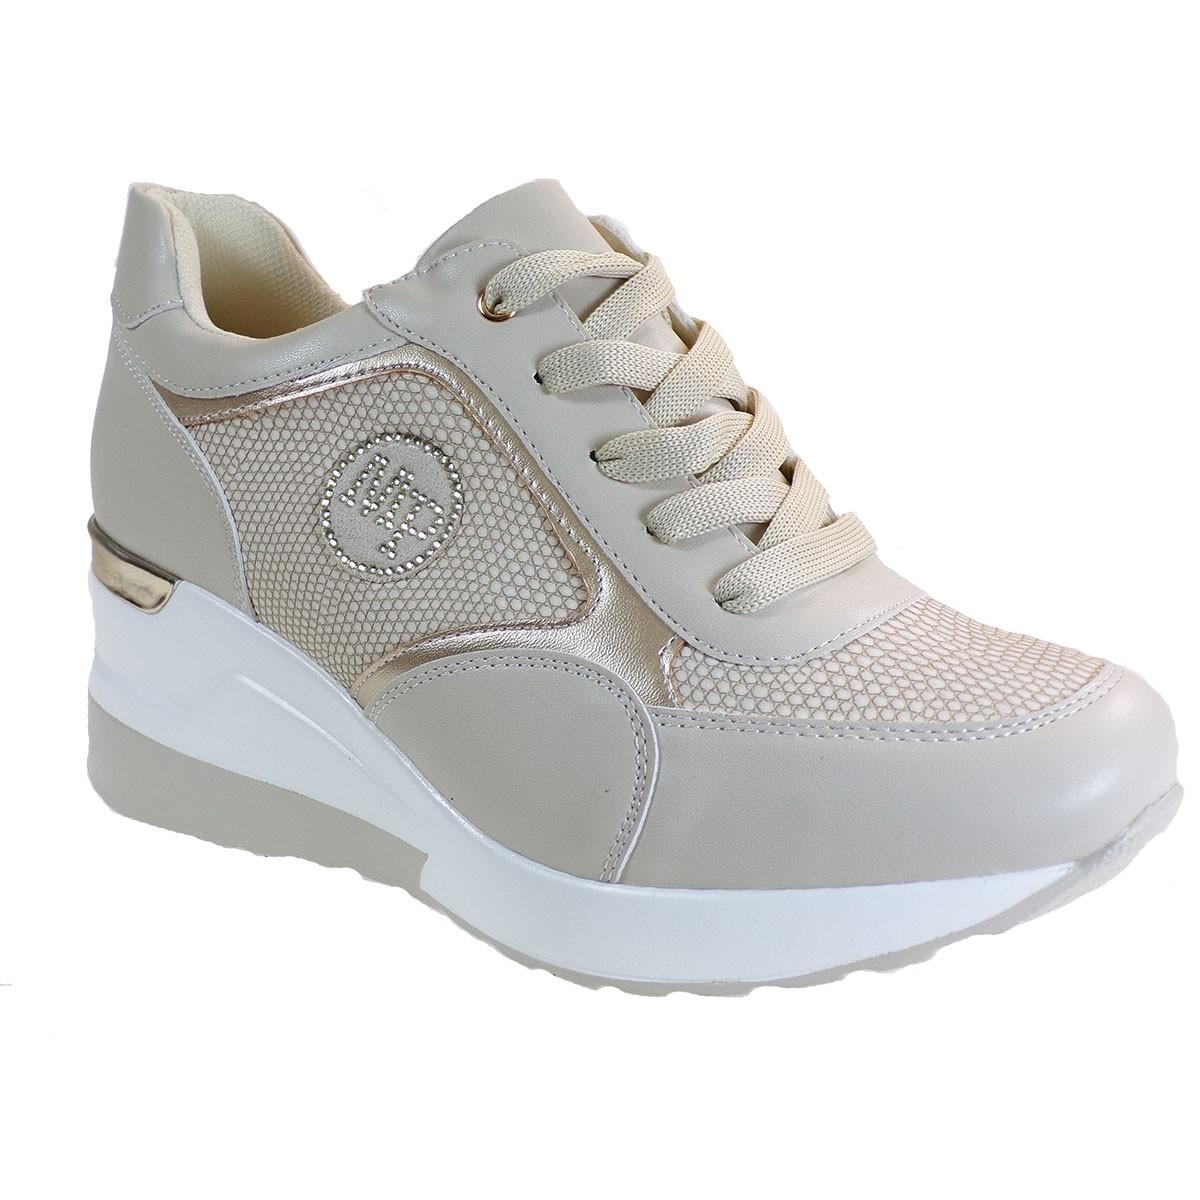 Bagiota Shoes Γυναικεία Παπούτσια Sneakers Αθλητικά H8987 Μπέζ